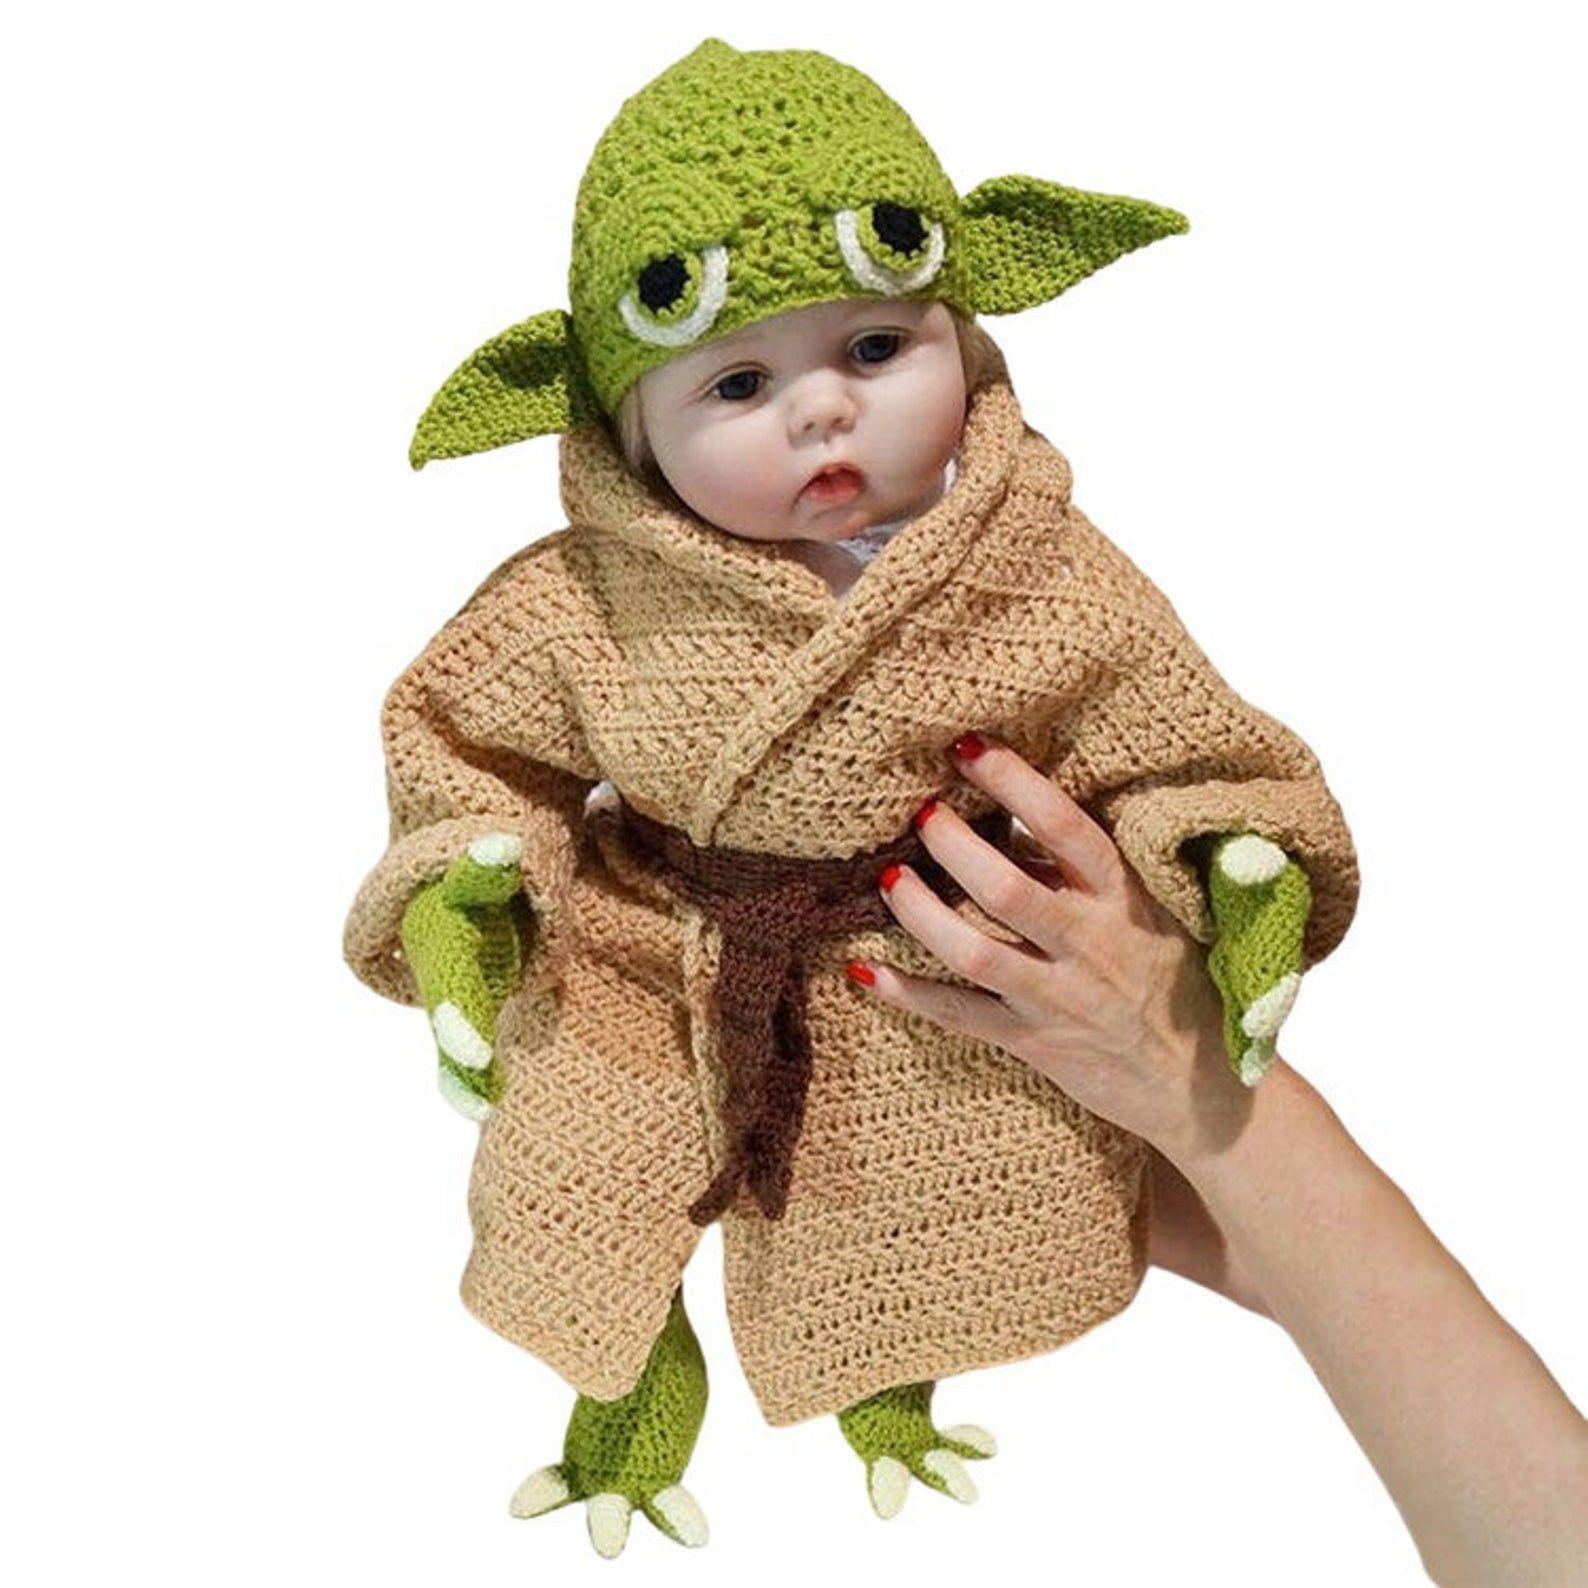 Image of crocheted yoda costume